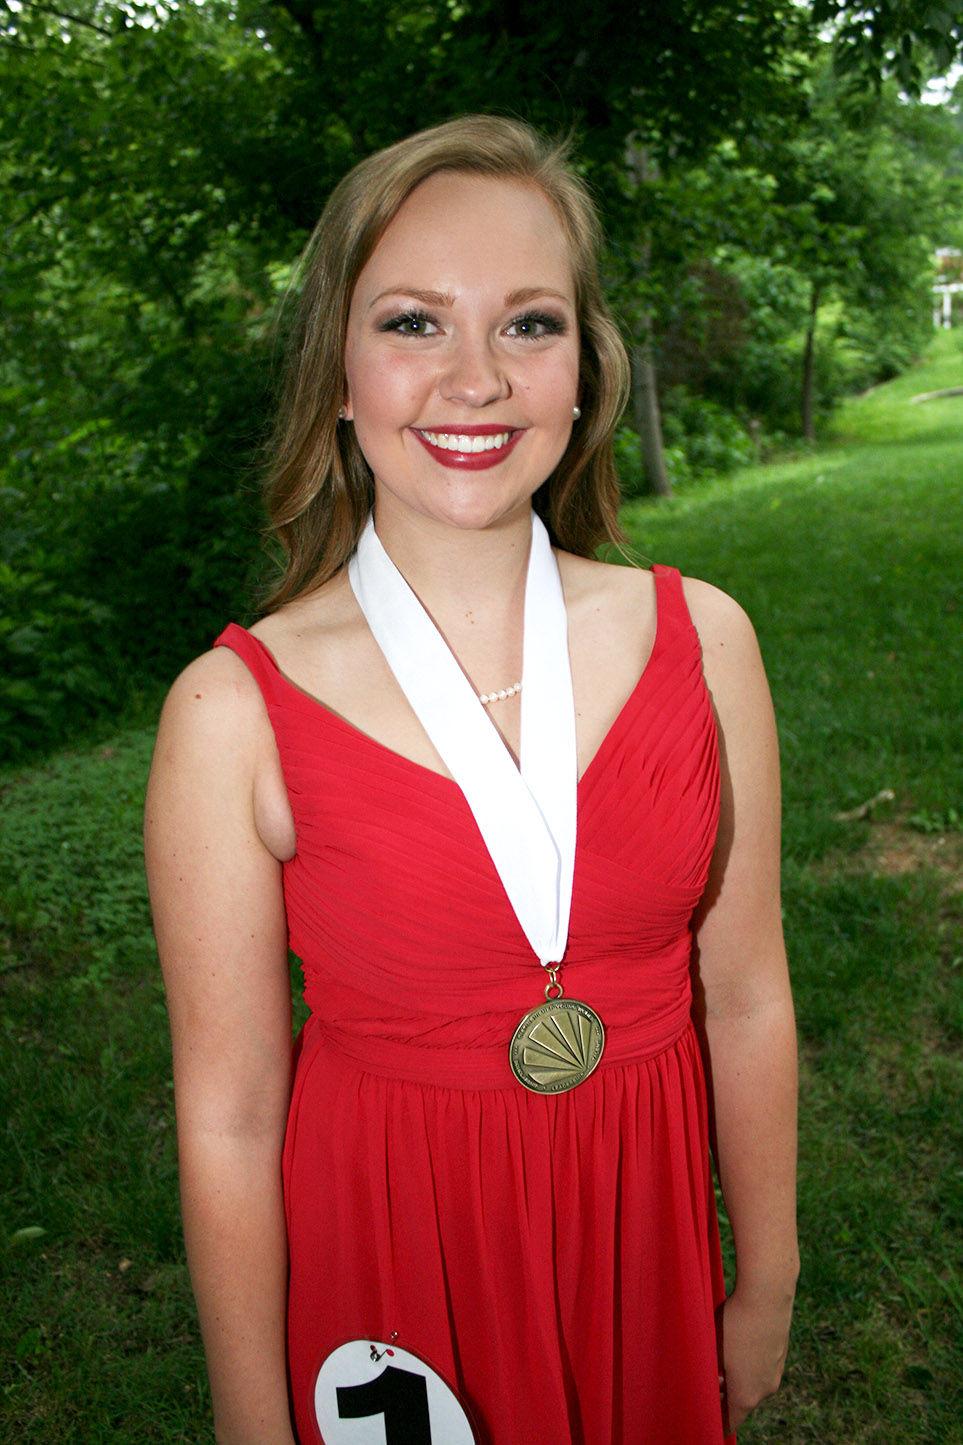 Alabama/saint clair county/ragland - Ragland S Savannah Jackson Wins St Clair County Distinguished Young Woman Program